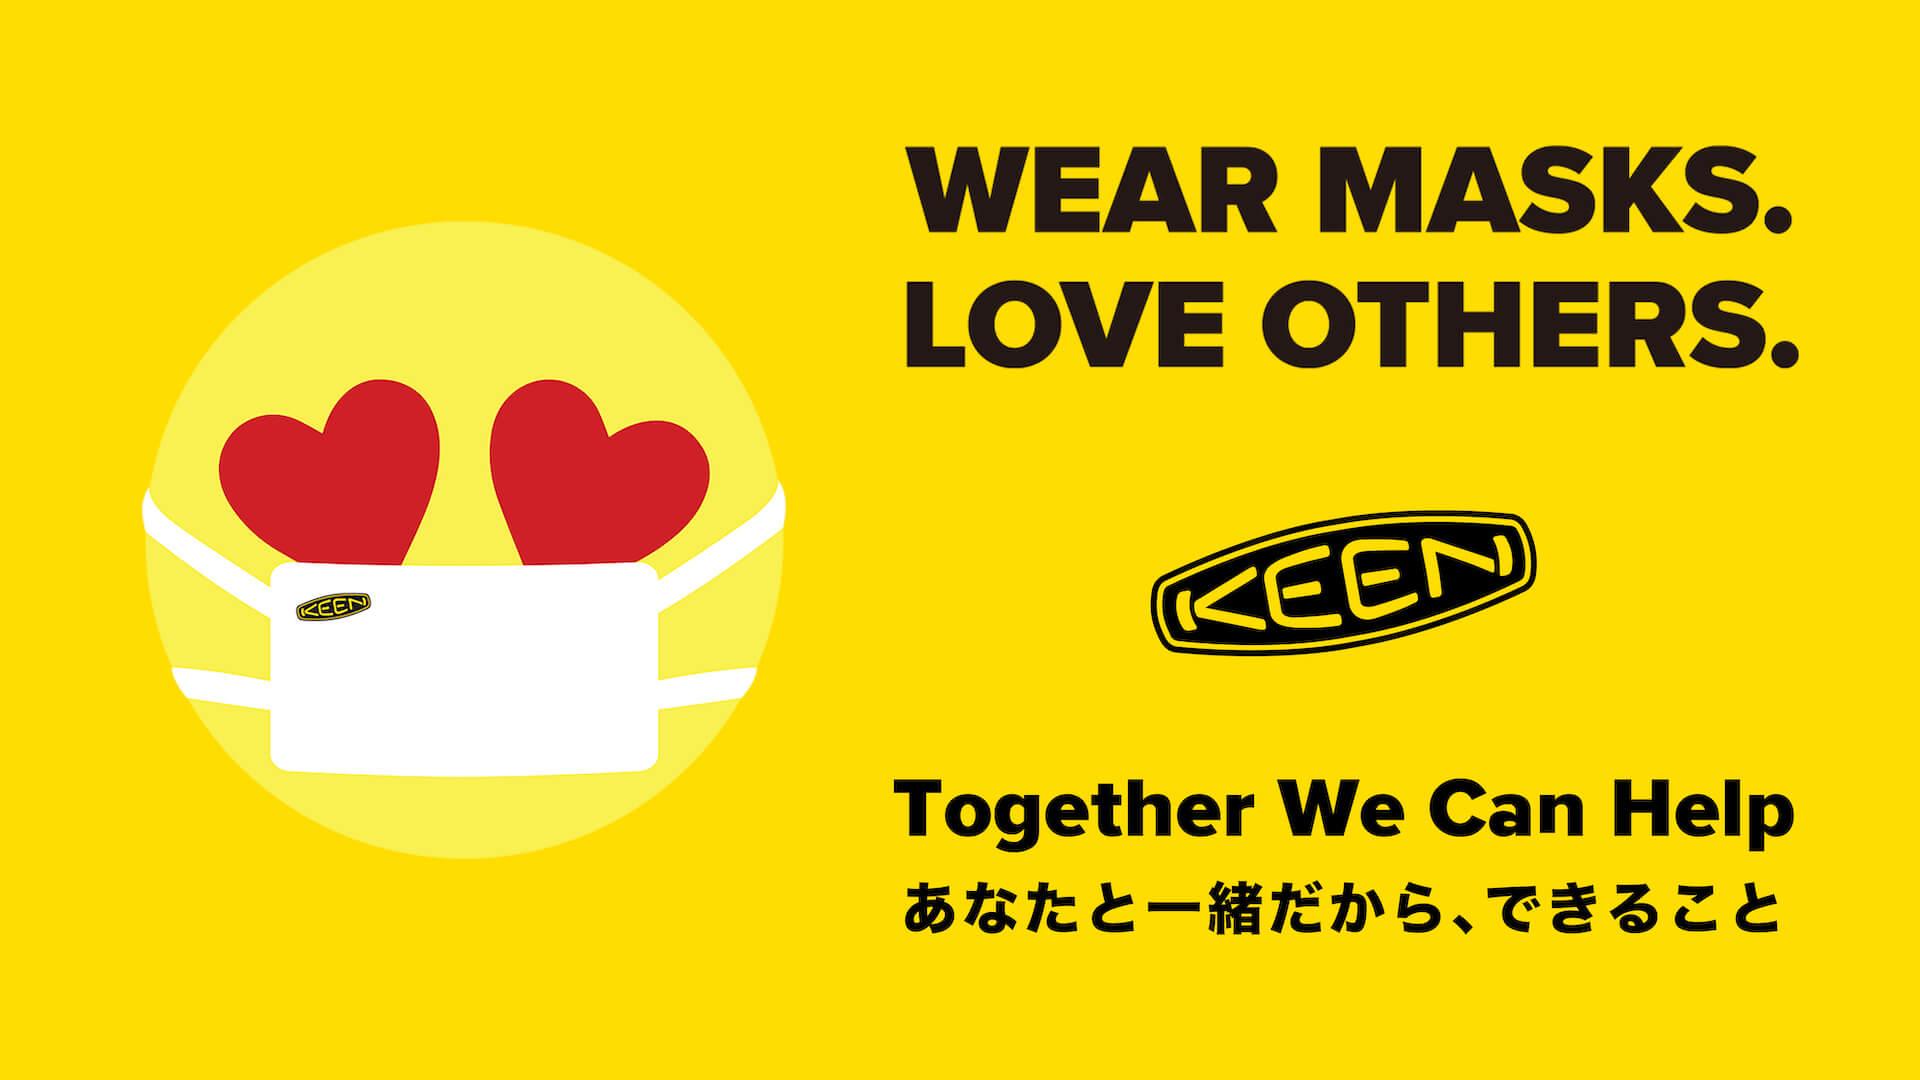 KEENがマスク15万枚を無償提供|タイの自社工場で洗って使えるリバーシブル立体マスクの製造を開始 lf200424_keen_mask_01